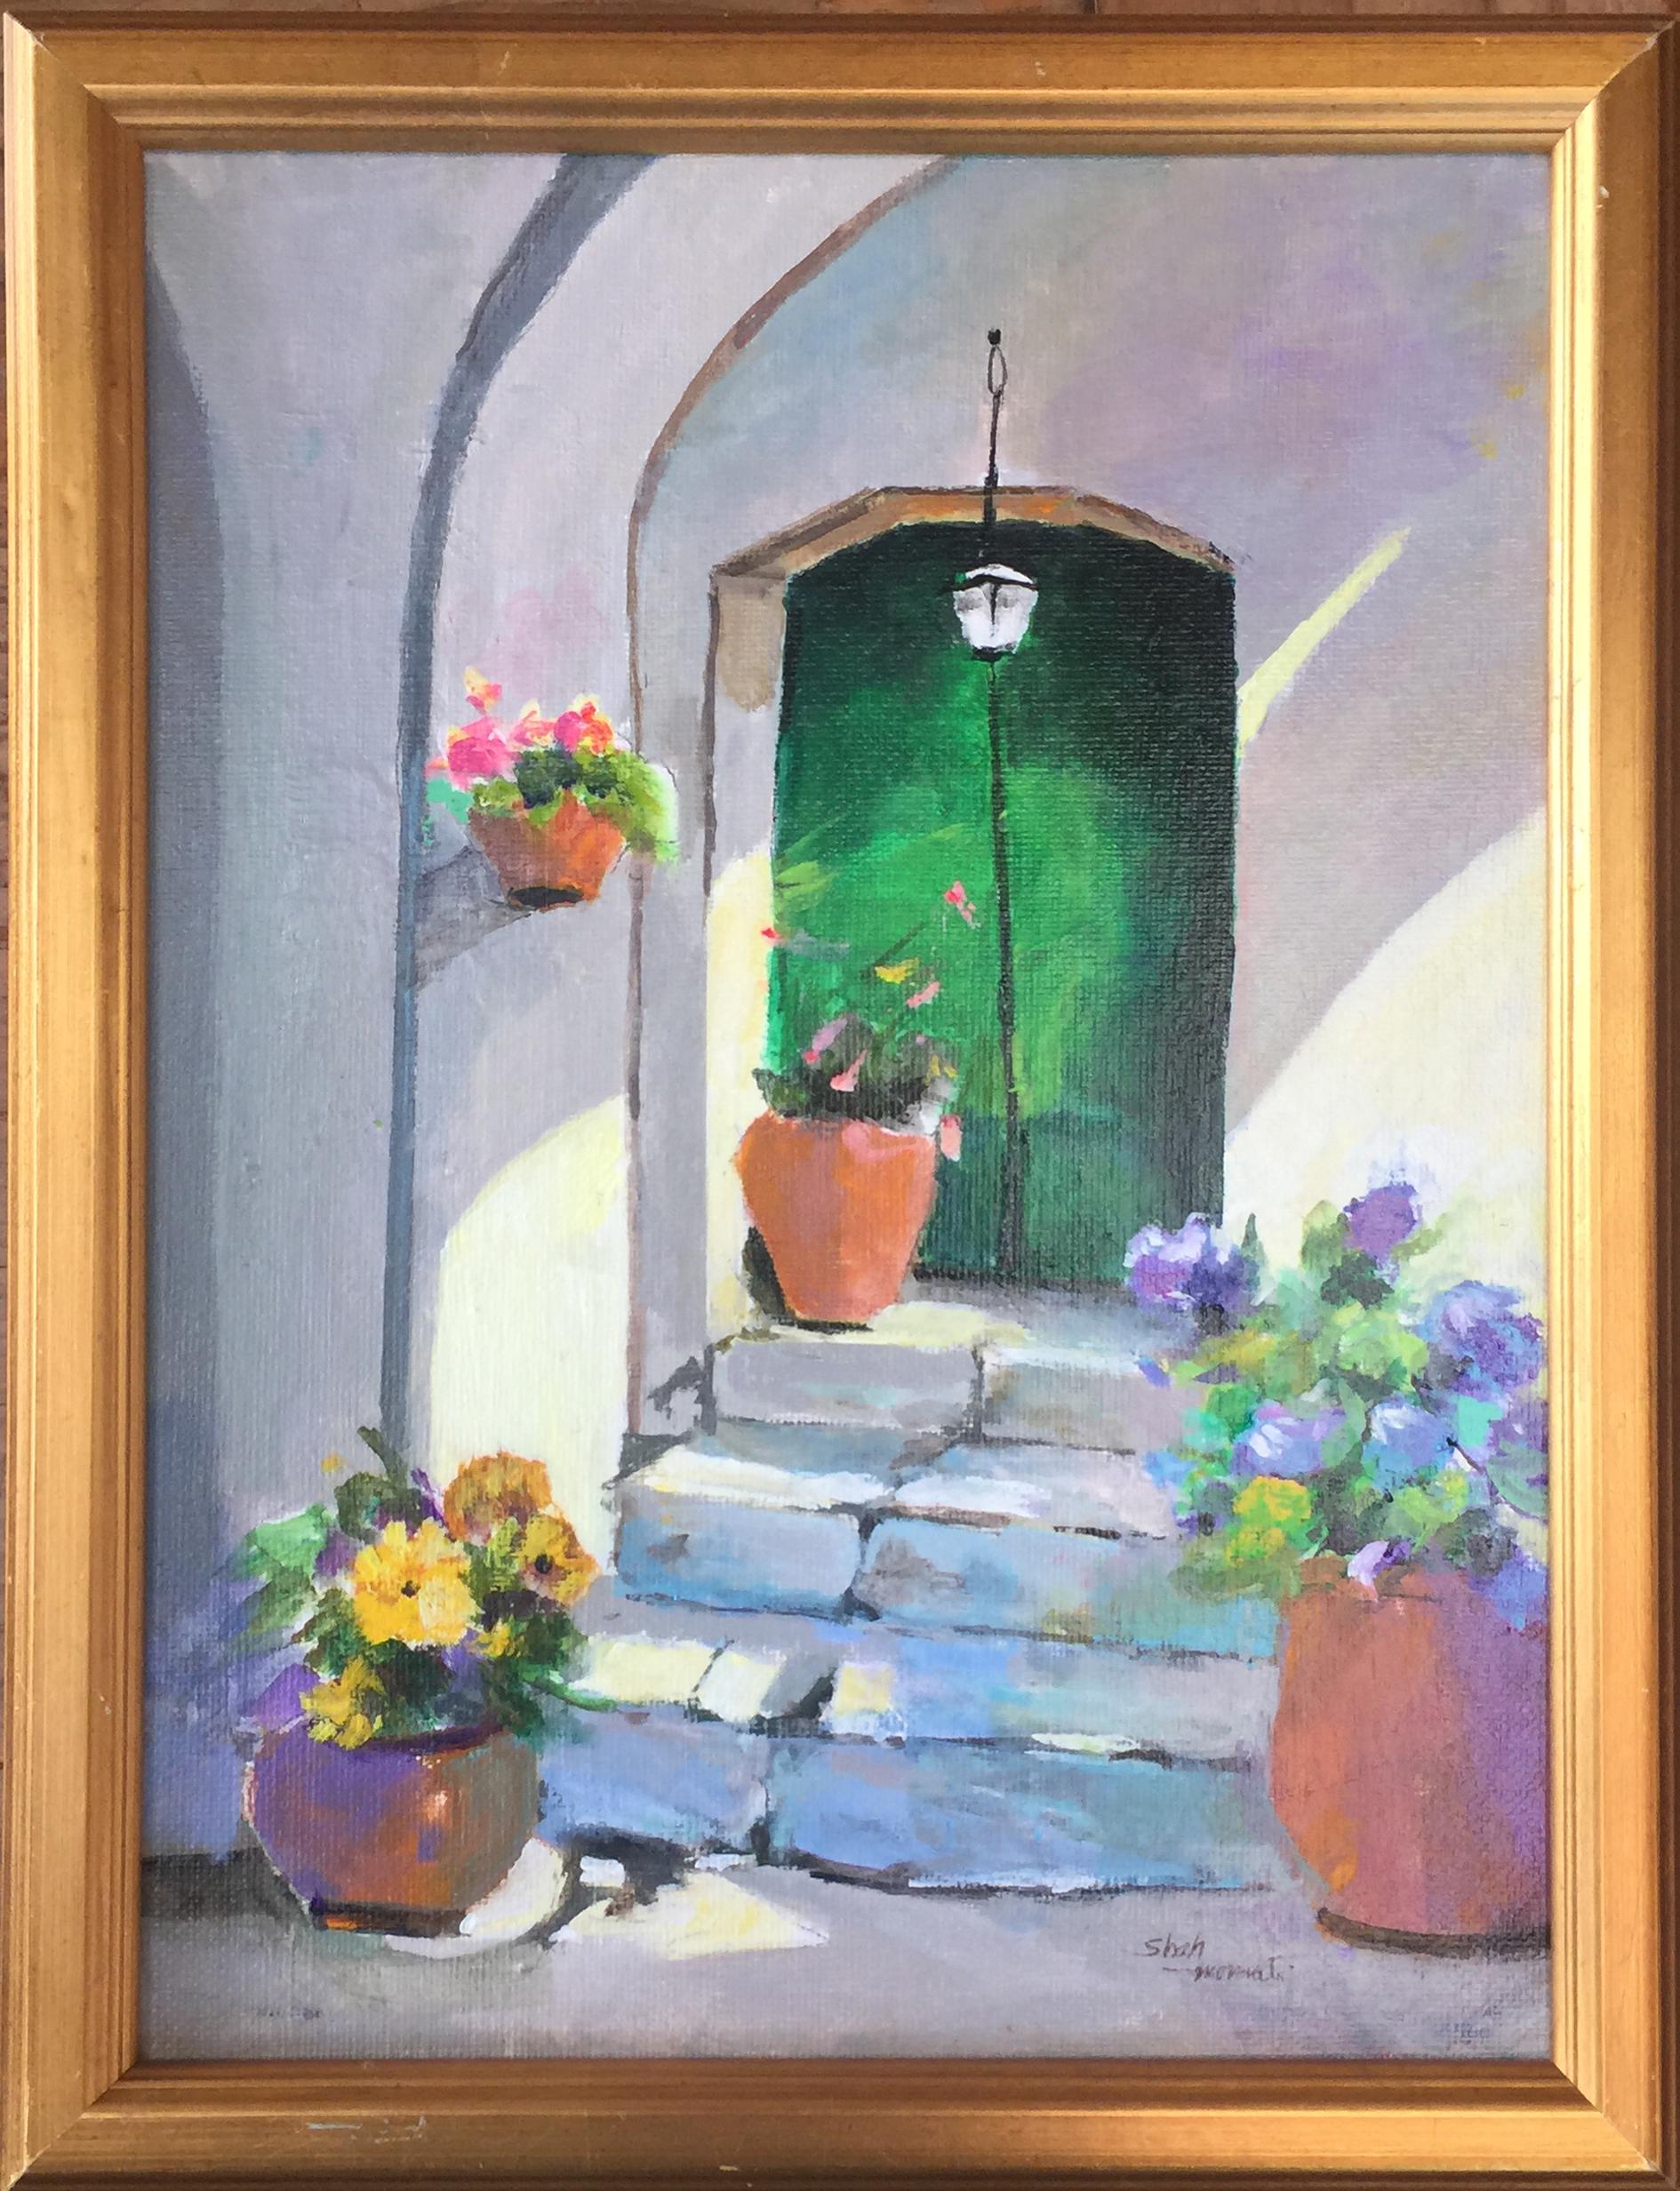 Green Door - Shah Morovati